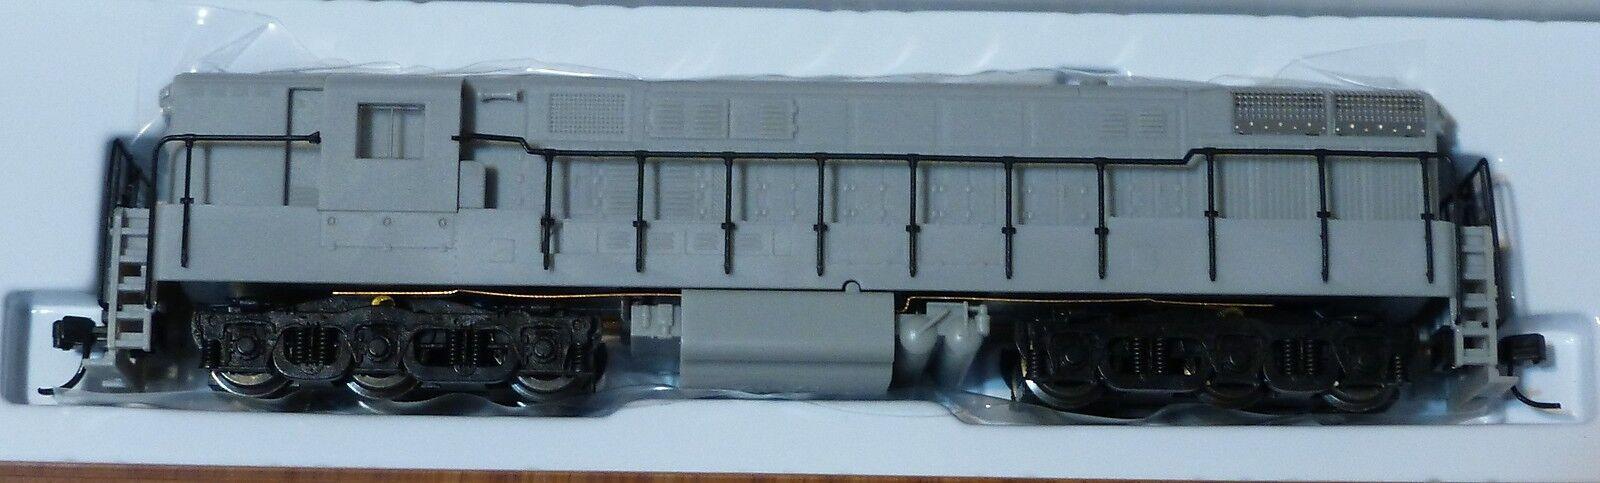 ATLAS N  49560 DIESEL FM H2466 Trainmaster fase 2 alimentatoUNDECORATED